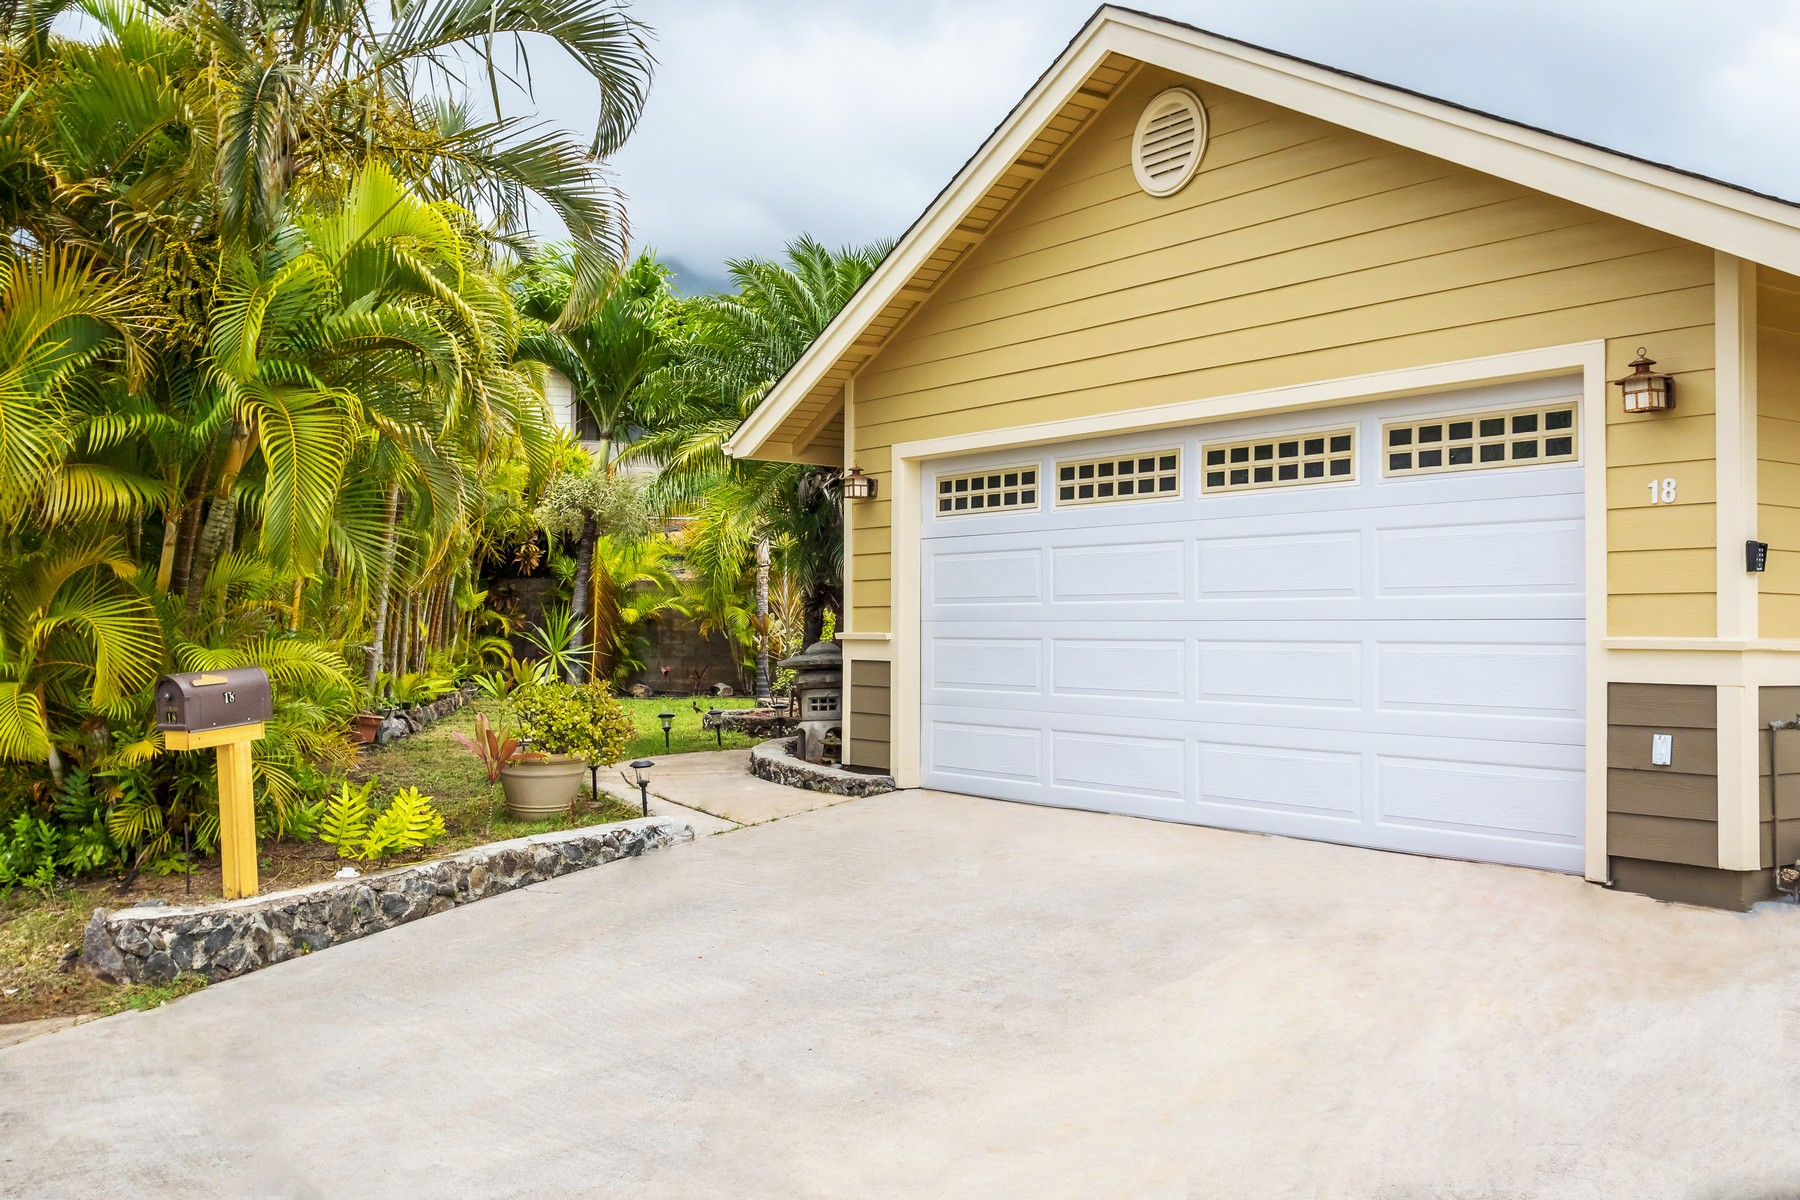 獨棟家庭住宅 為 出售 在 Single Level Island Living at Olena @ Kehalani 18 Hapua Pl Wailuku, 夏威夷 96793 美國